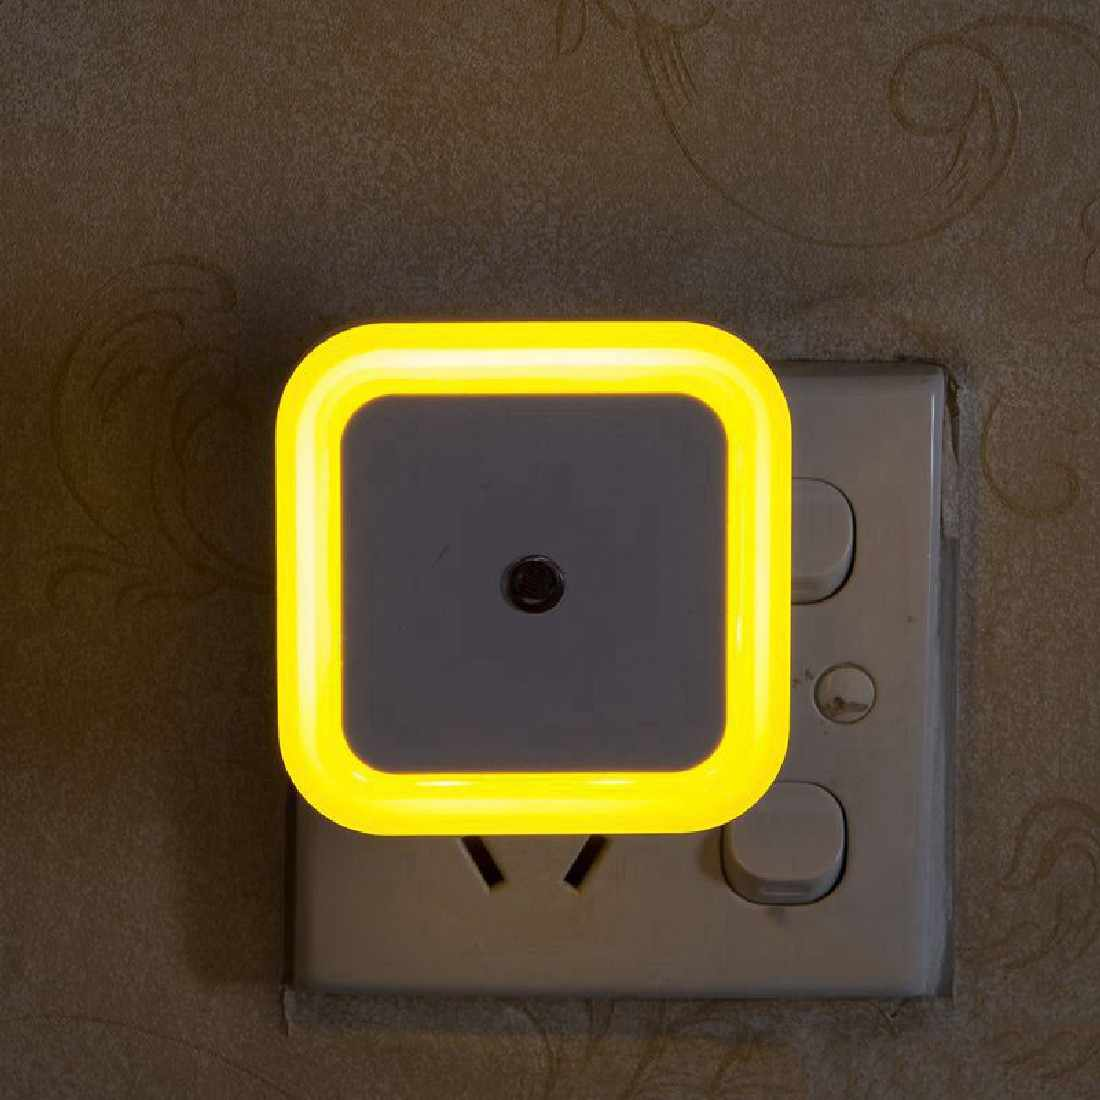 Household Square Auto LED Light Induction Sensor Control Bedroom Night  Lights Bed Lamp US Plug Smart Lamp Sleep Light|Night Lights| - AliExpress